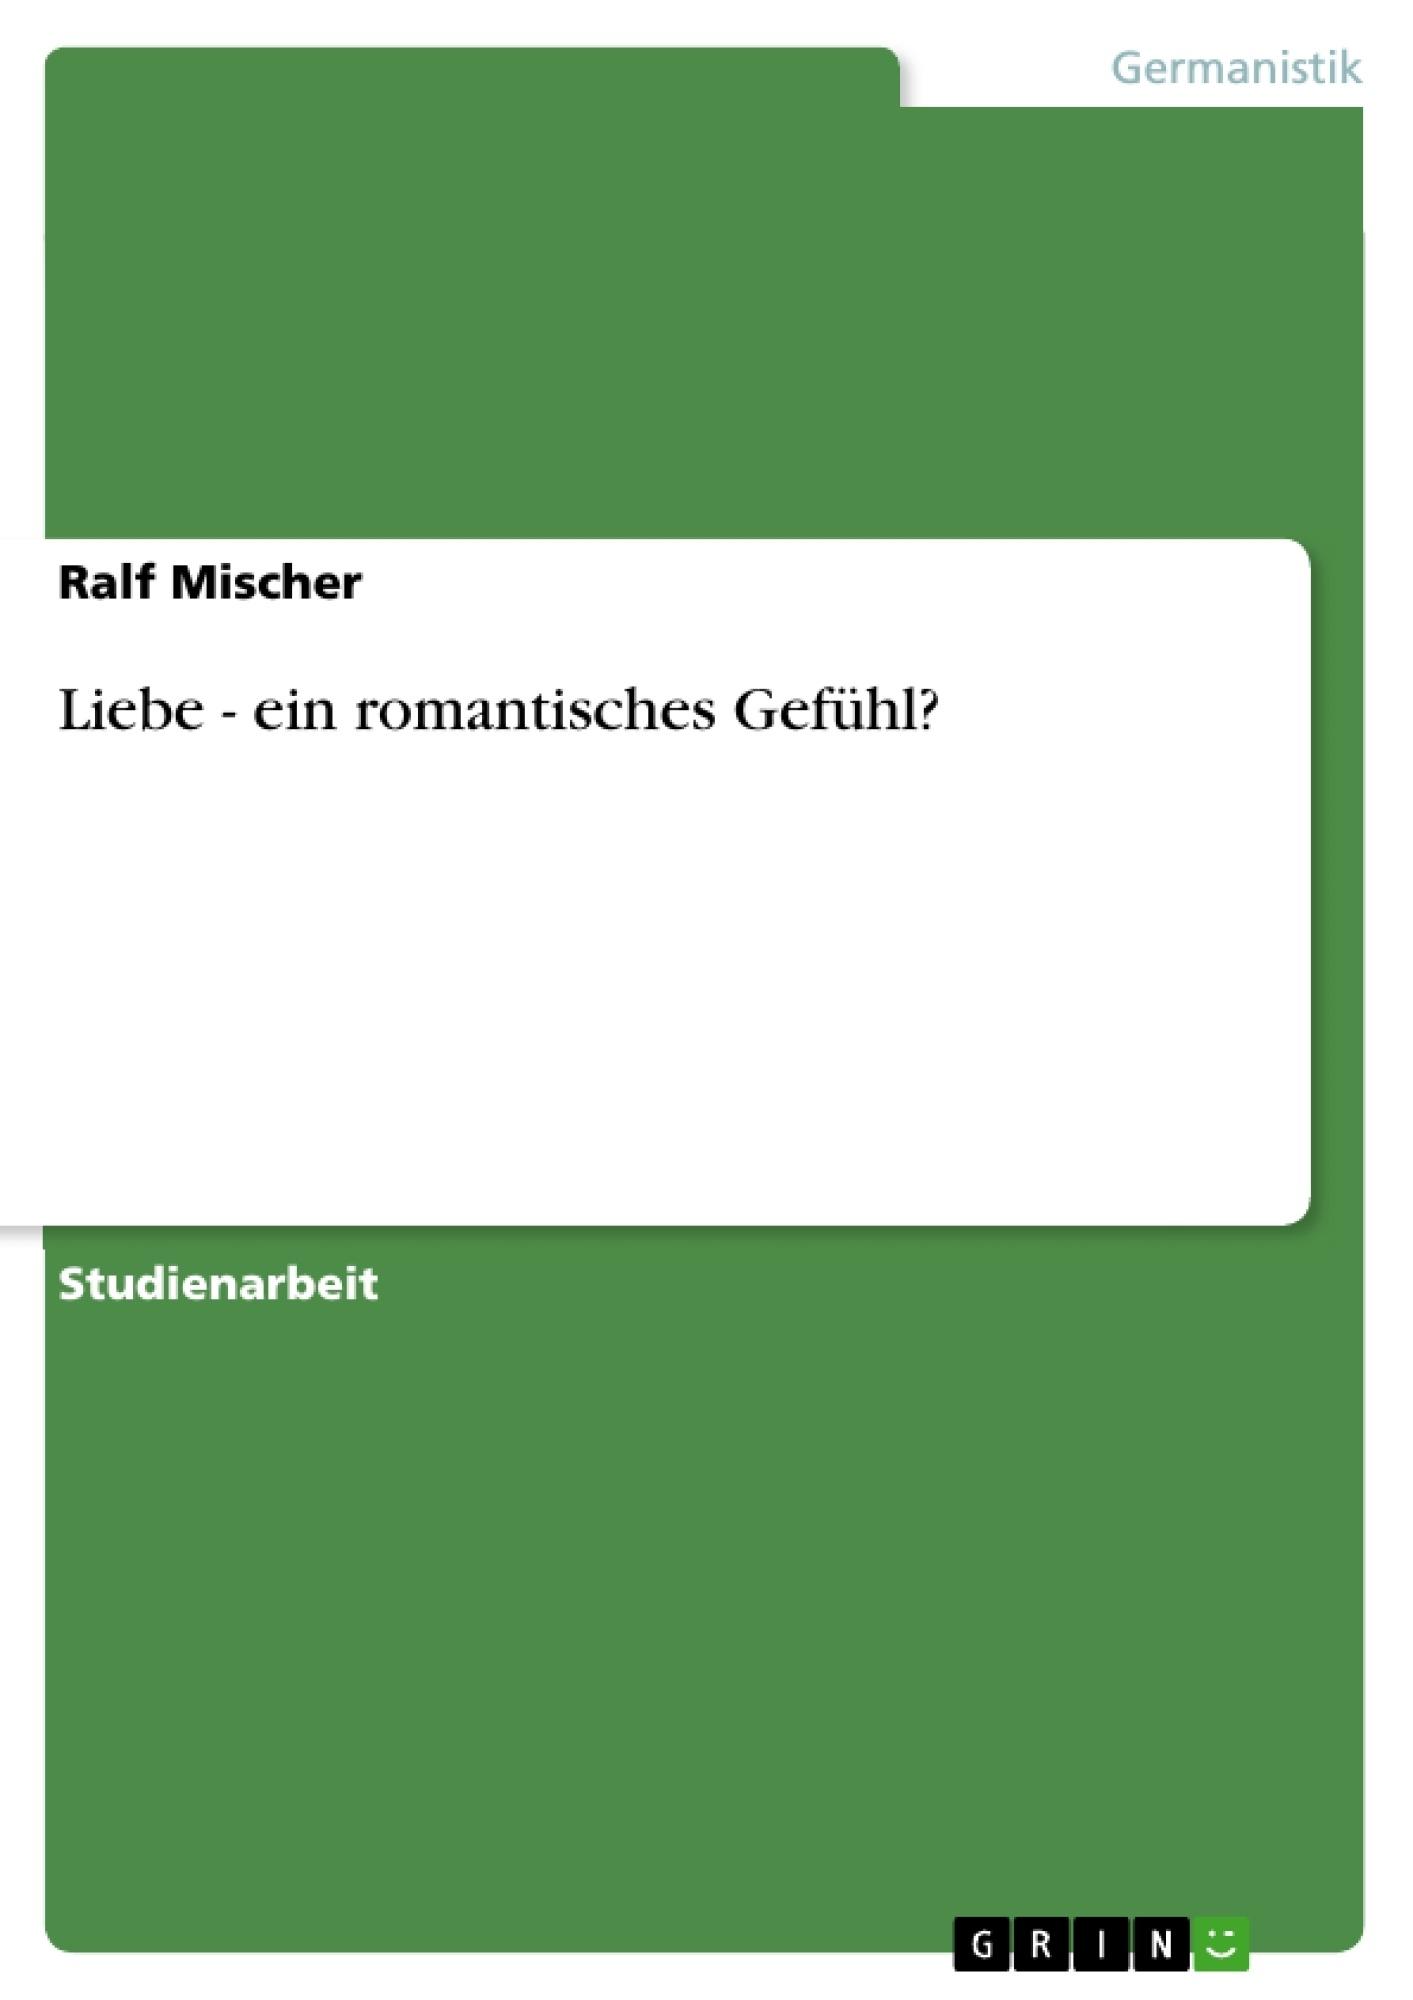 Macbeth literary analysis essay